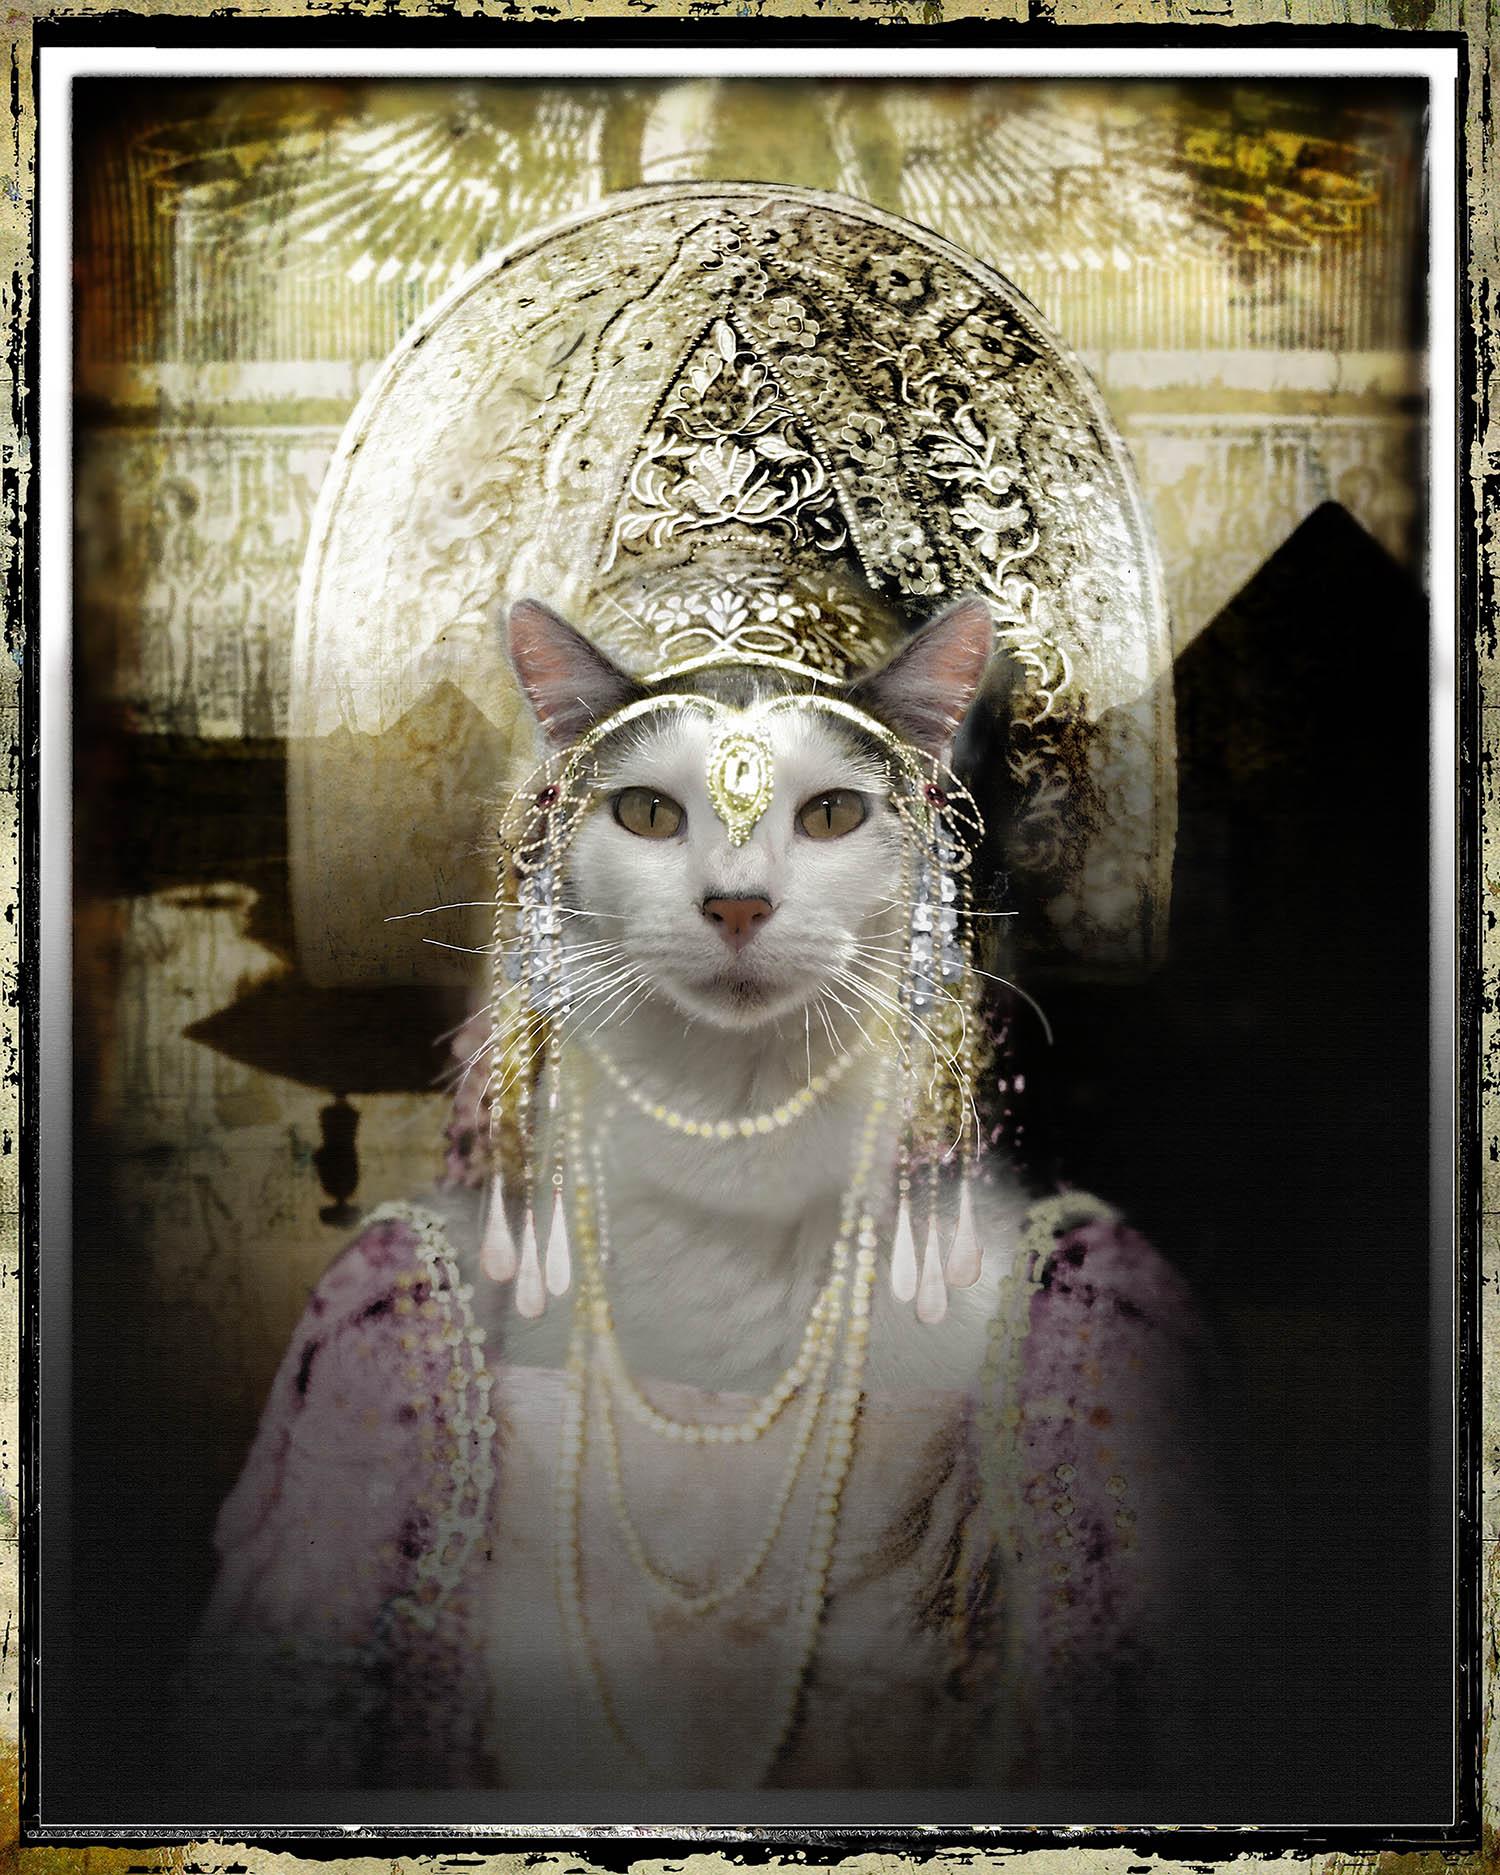 The Goddess Bast - version 2